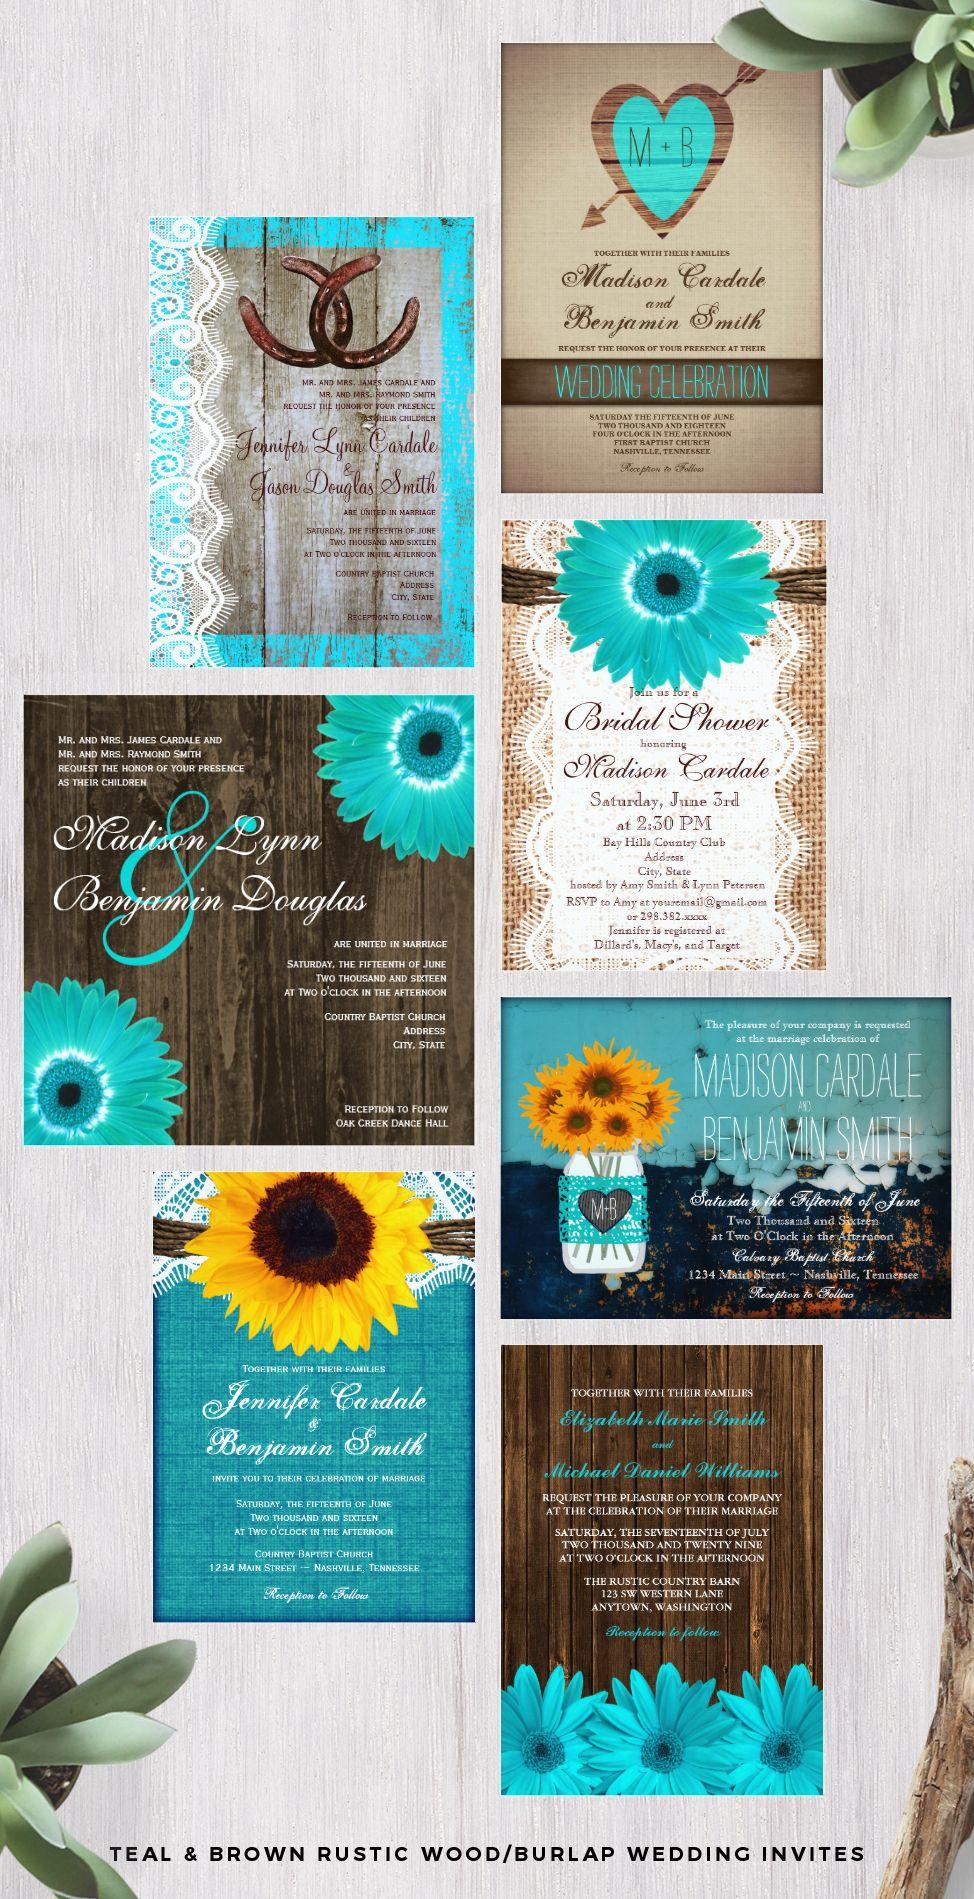 Teal Aqua Turquoise And Brown Rustic Wood Burlap Wedding Invitations